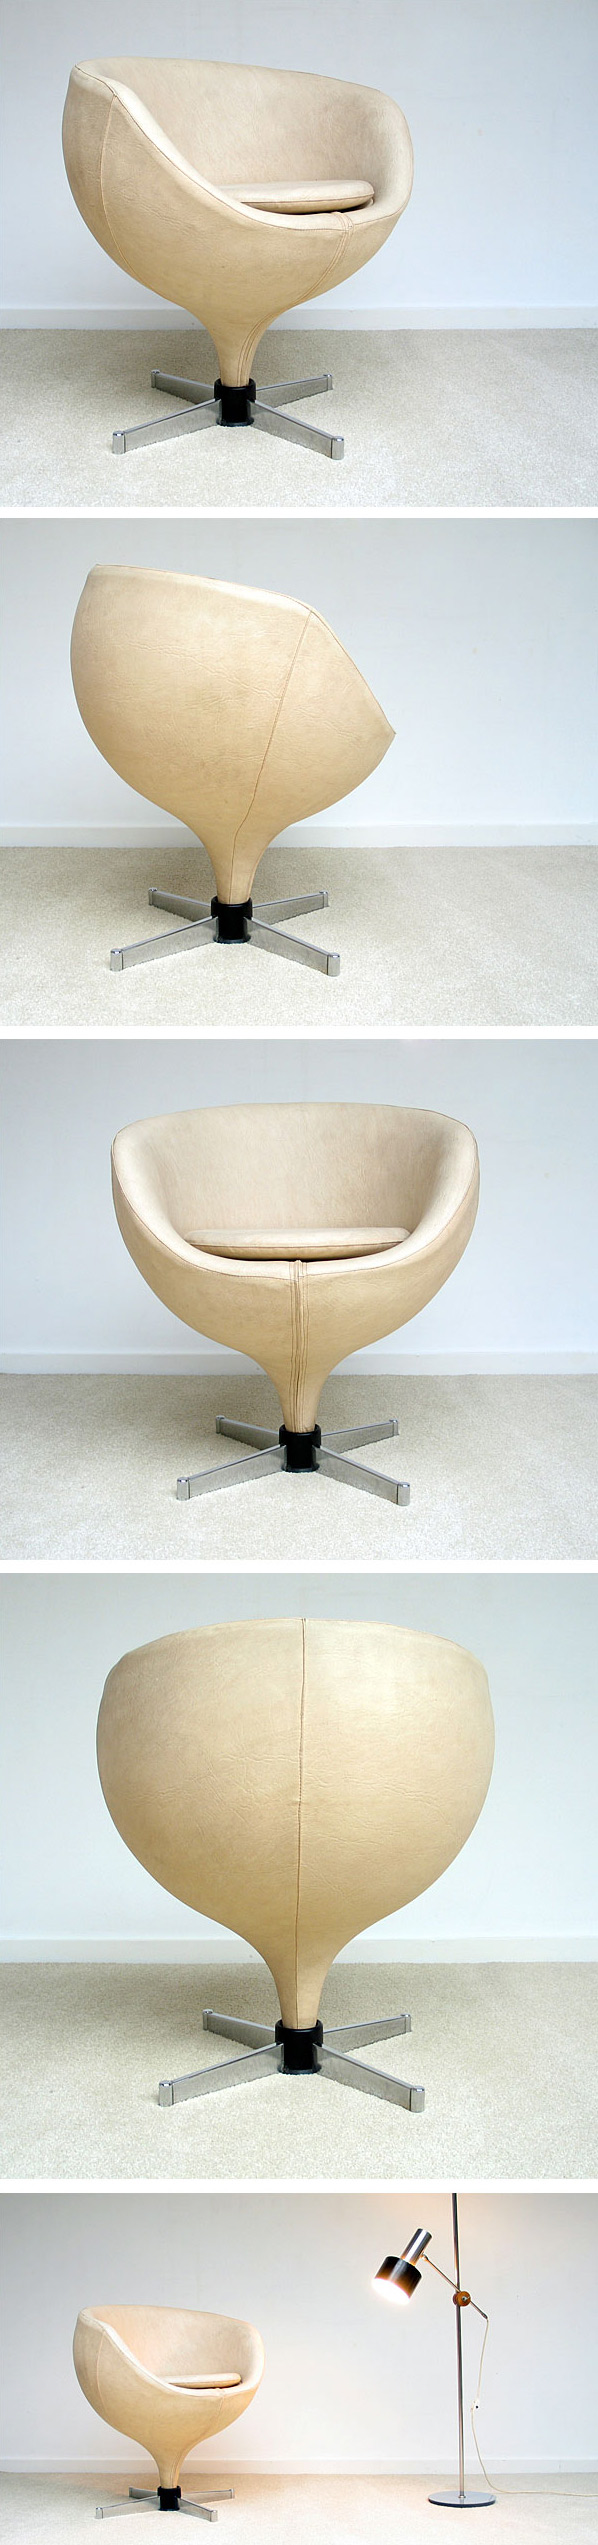 Pierre Guariche ball side chair model Luna Meurop 1960 Large